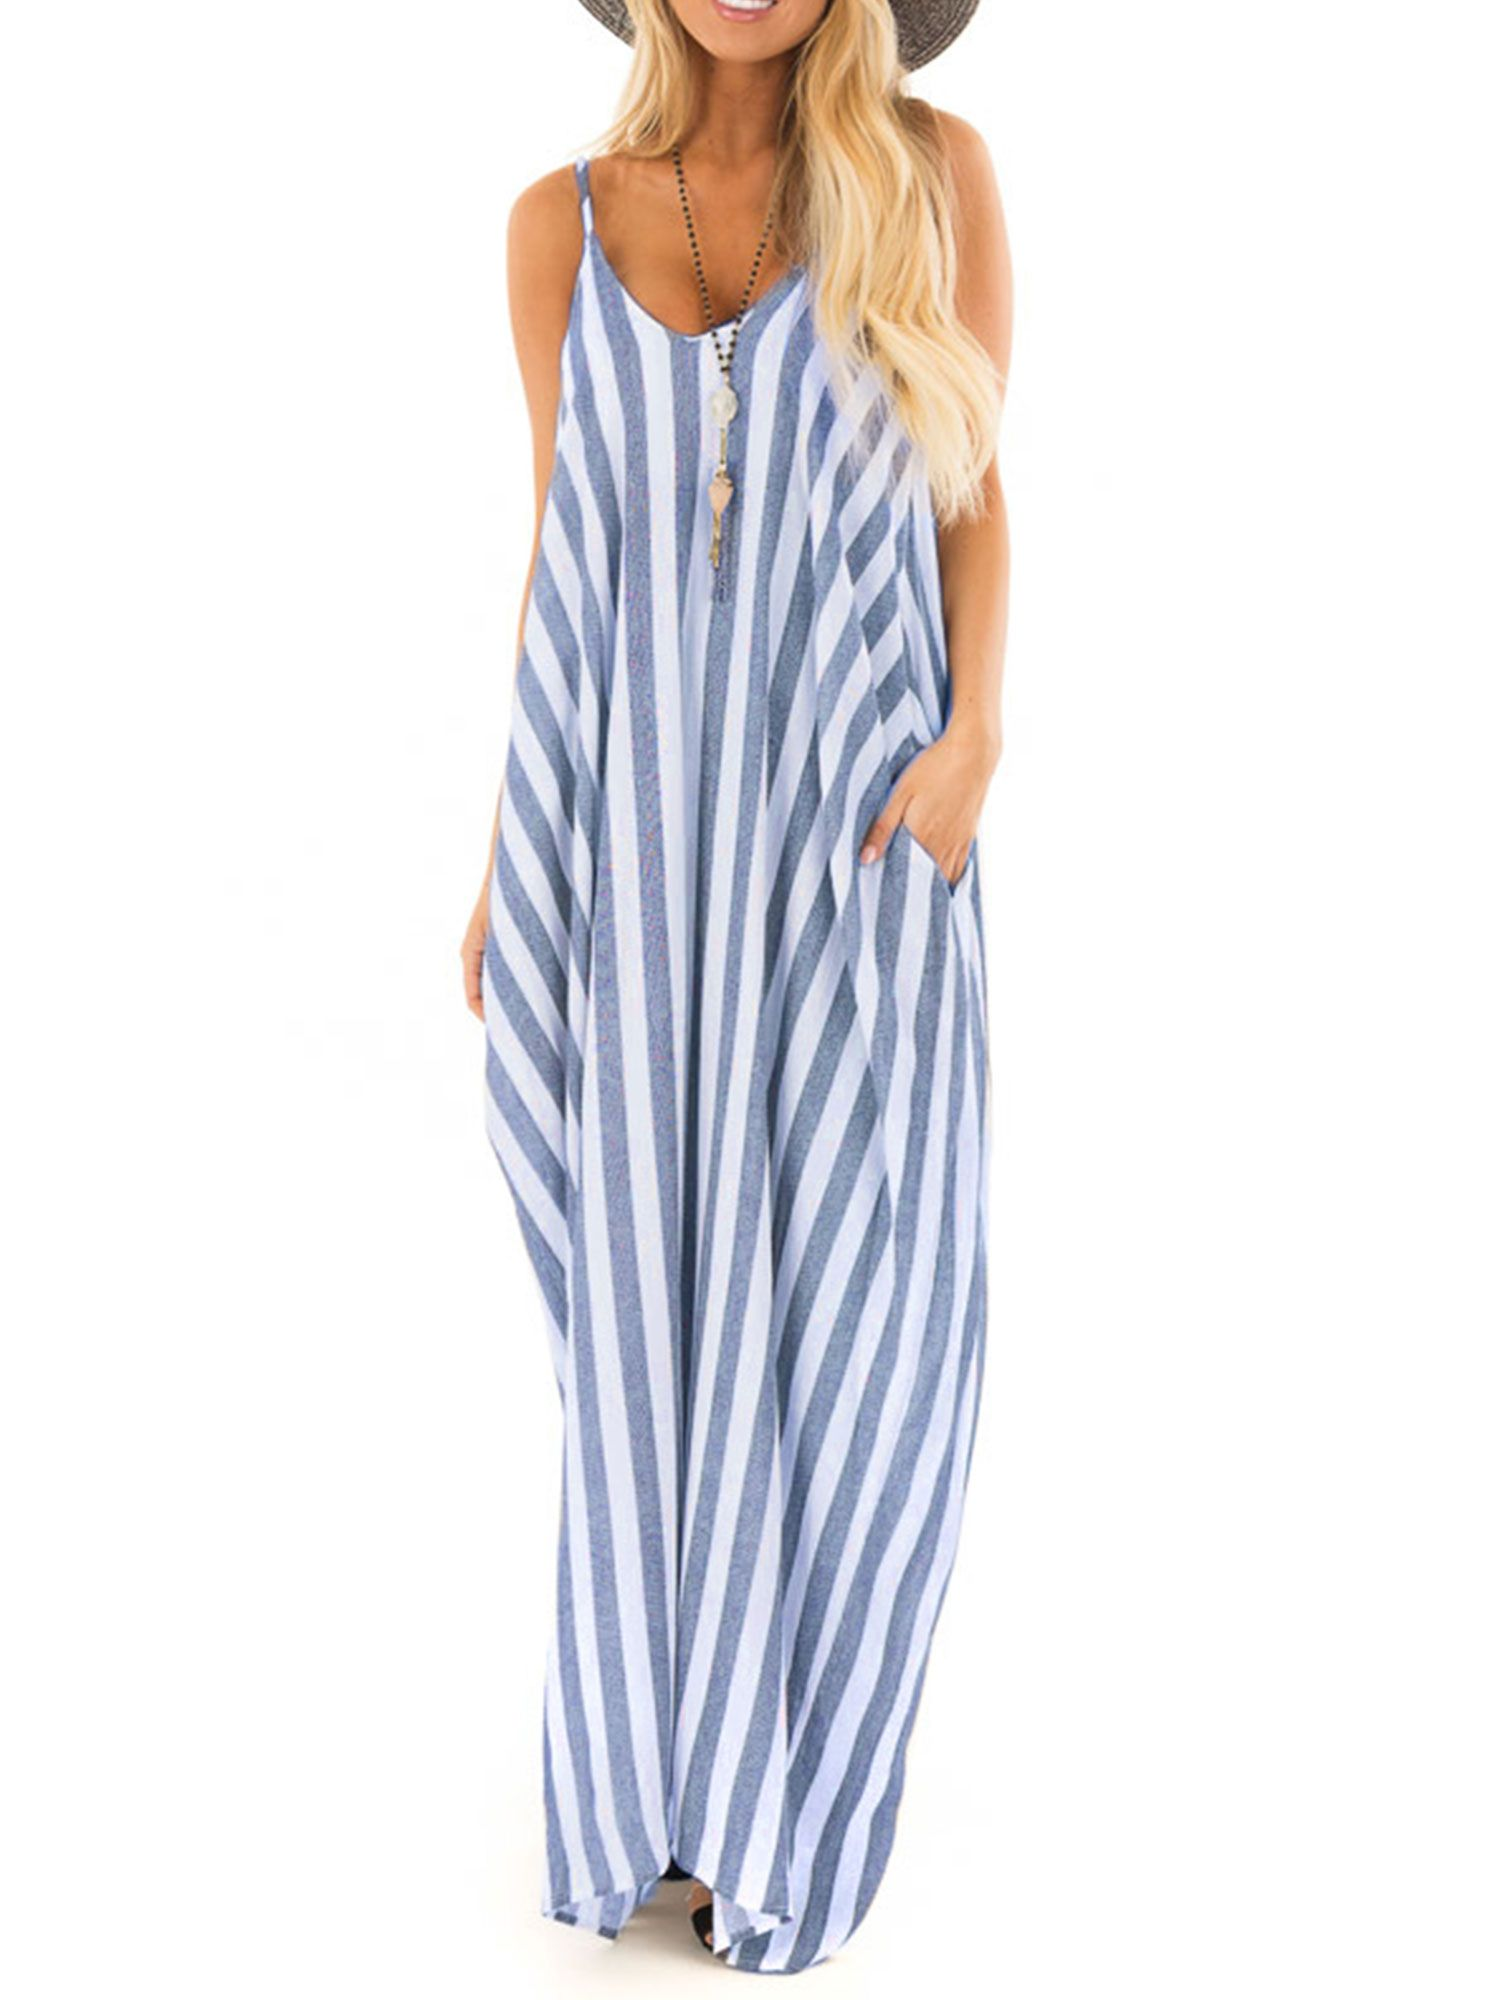 Himone Summer Holiday Women Strappy Cami Striped Long Boho Dress Ladies Beach Maxi Sundress Walmart Com Maxi Dress Boho Dresses Long Boho Dress [ 2000 x 1500 Pixel ]